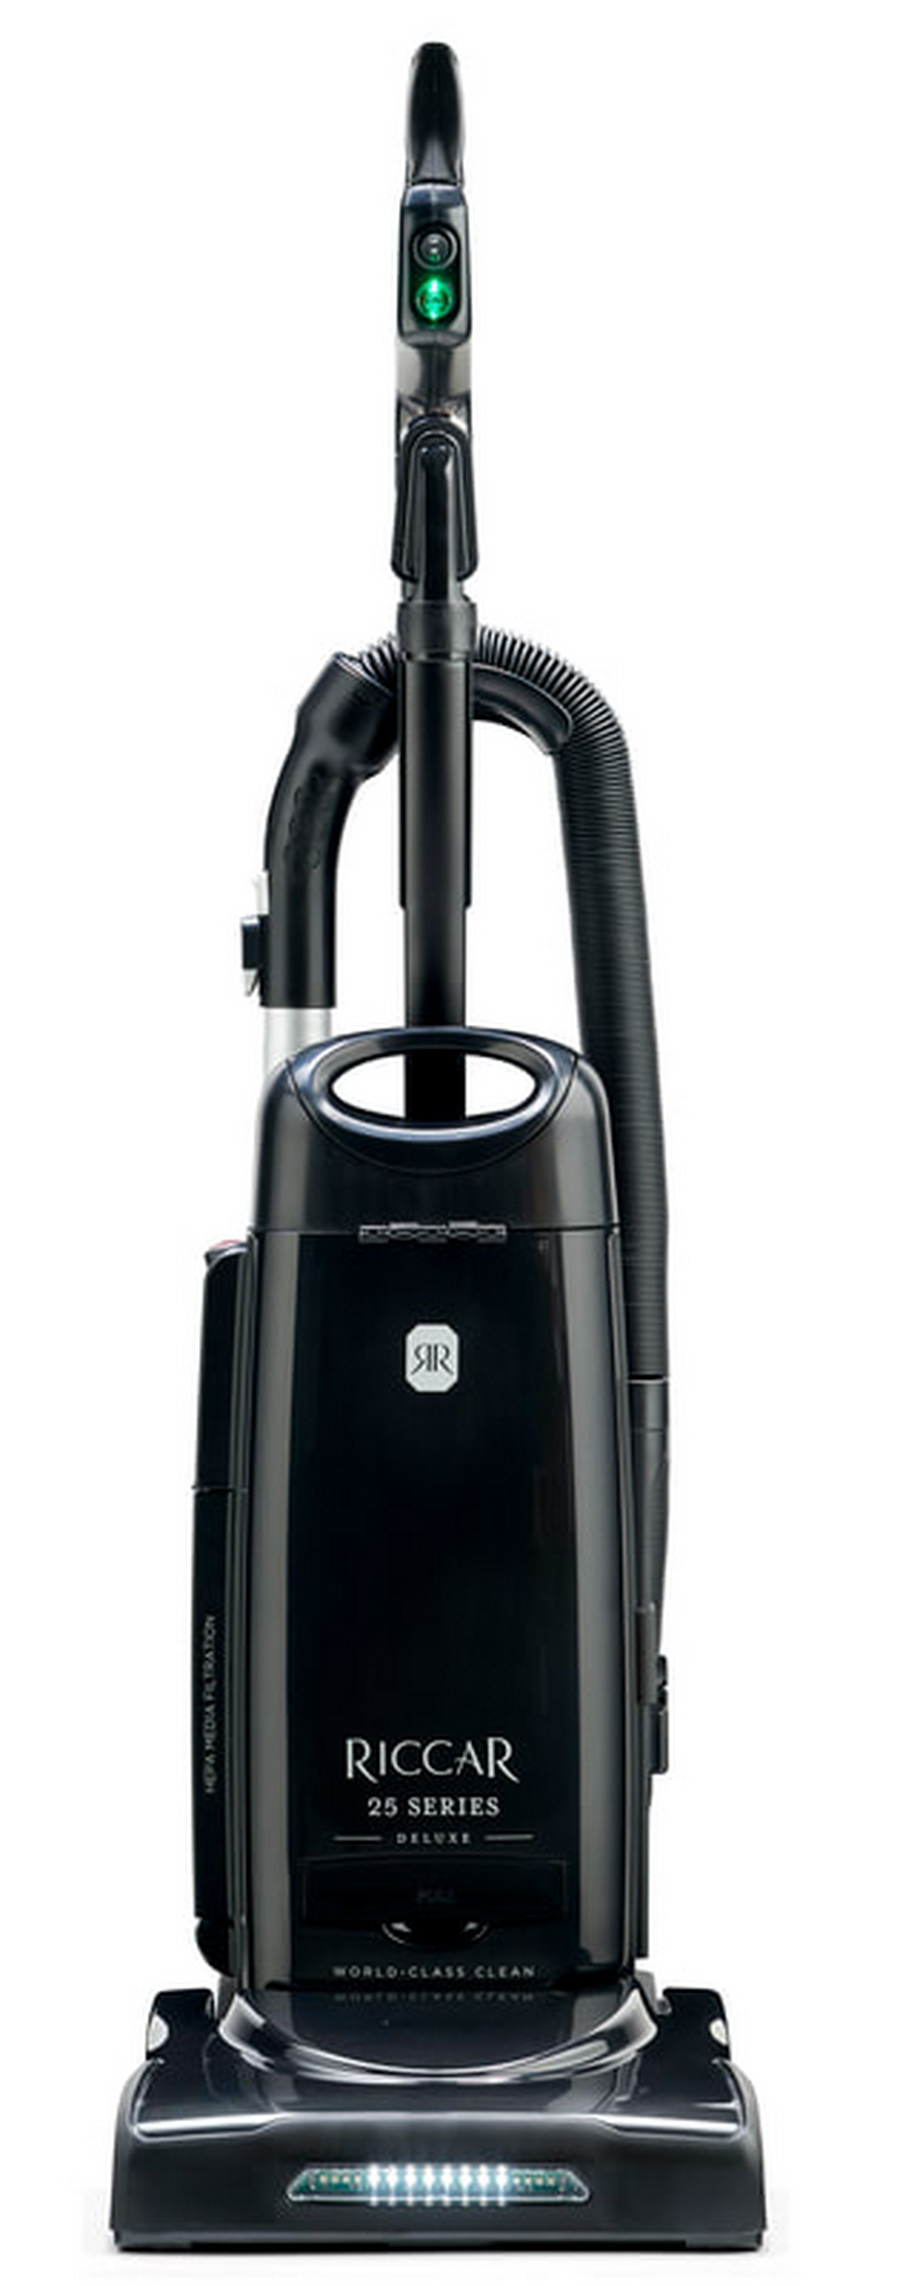 Riccar R25 Standard Clean Air Upright Vacuum